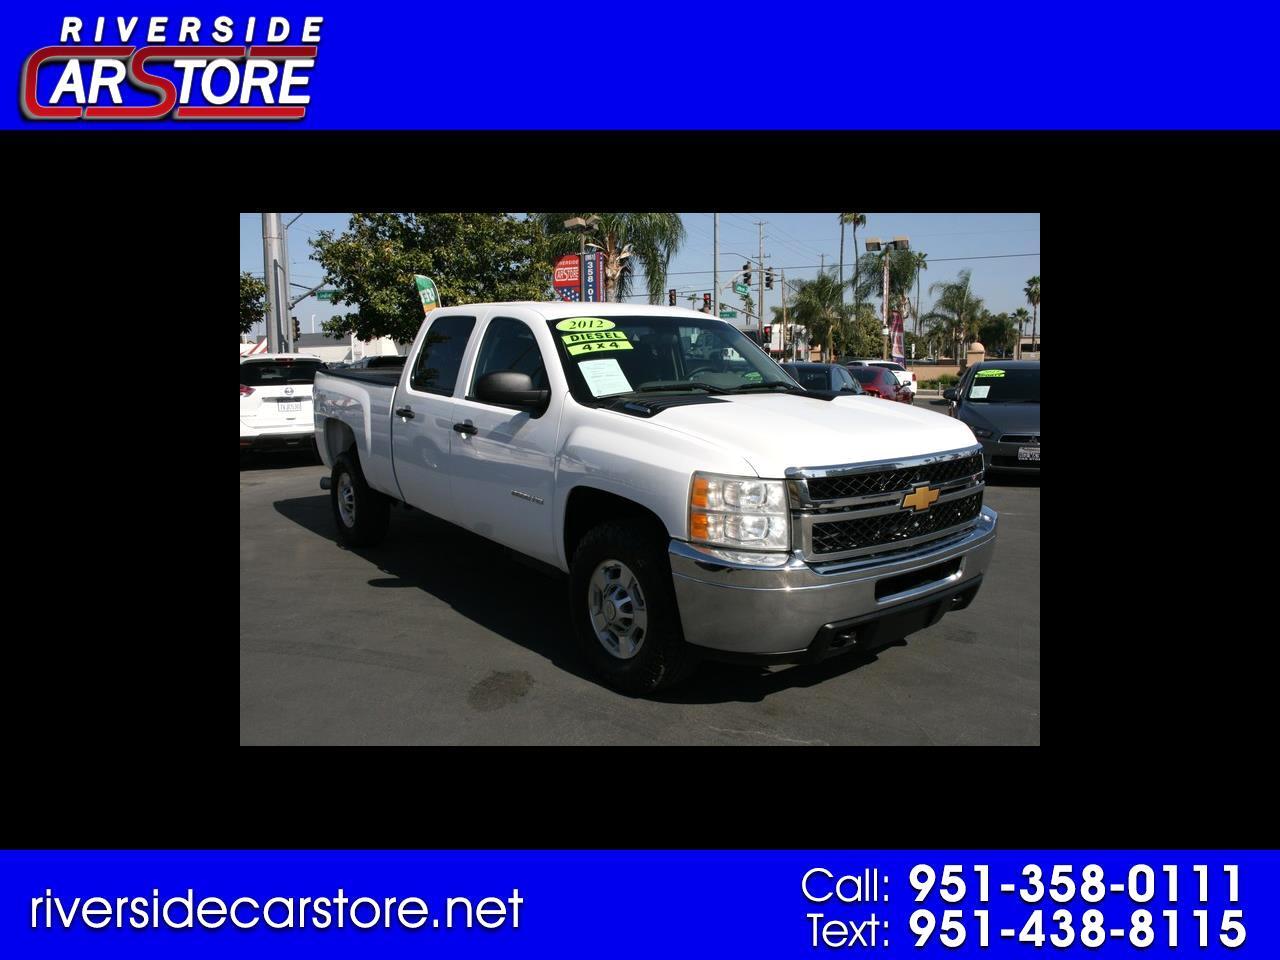 "Chevrolet Silverado 2500HD 4WD Crew Cab 153.7"" Work Truck 2012"